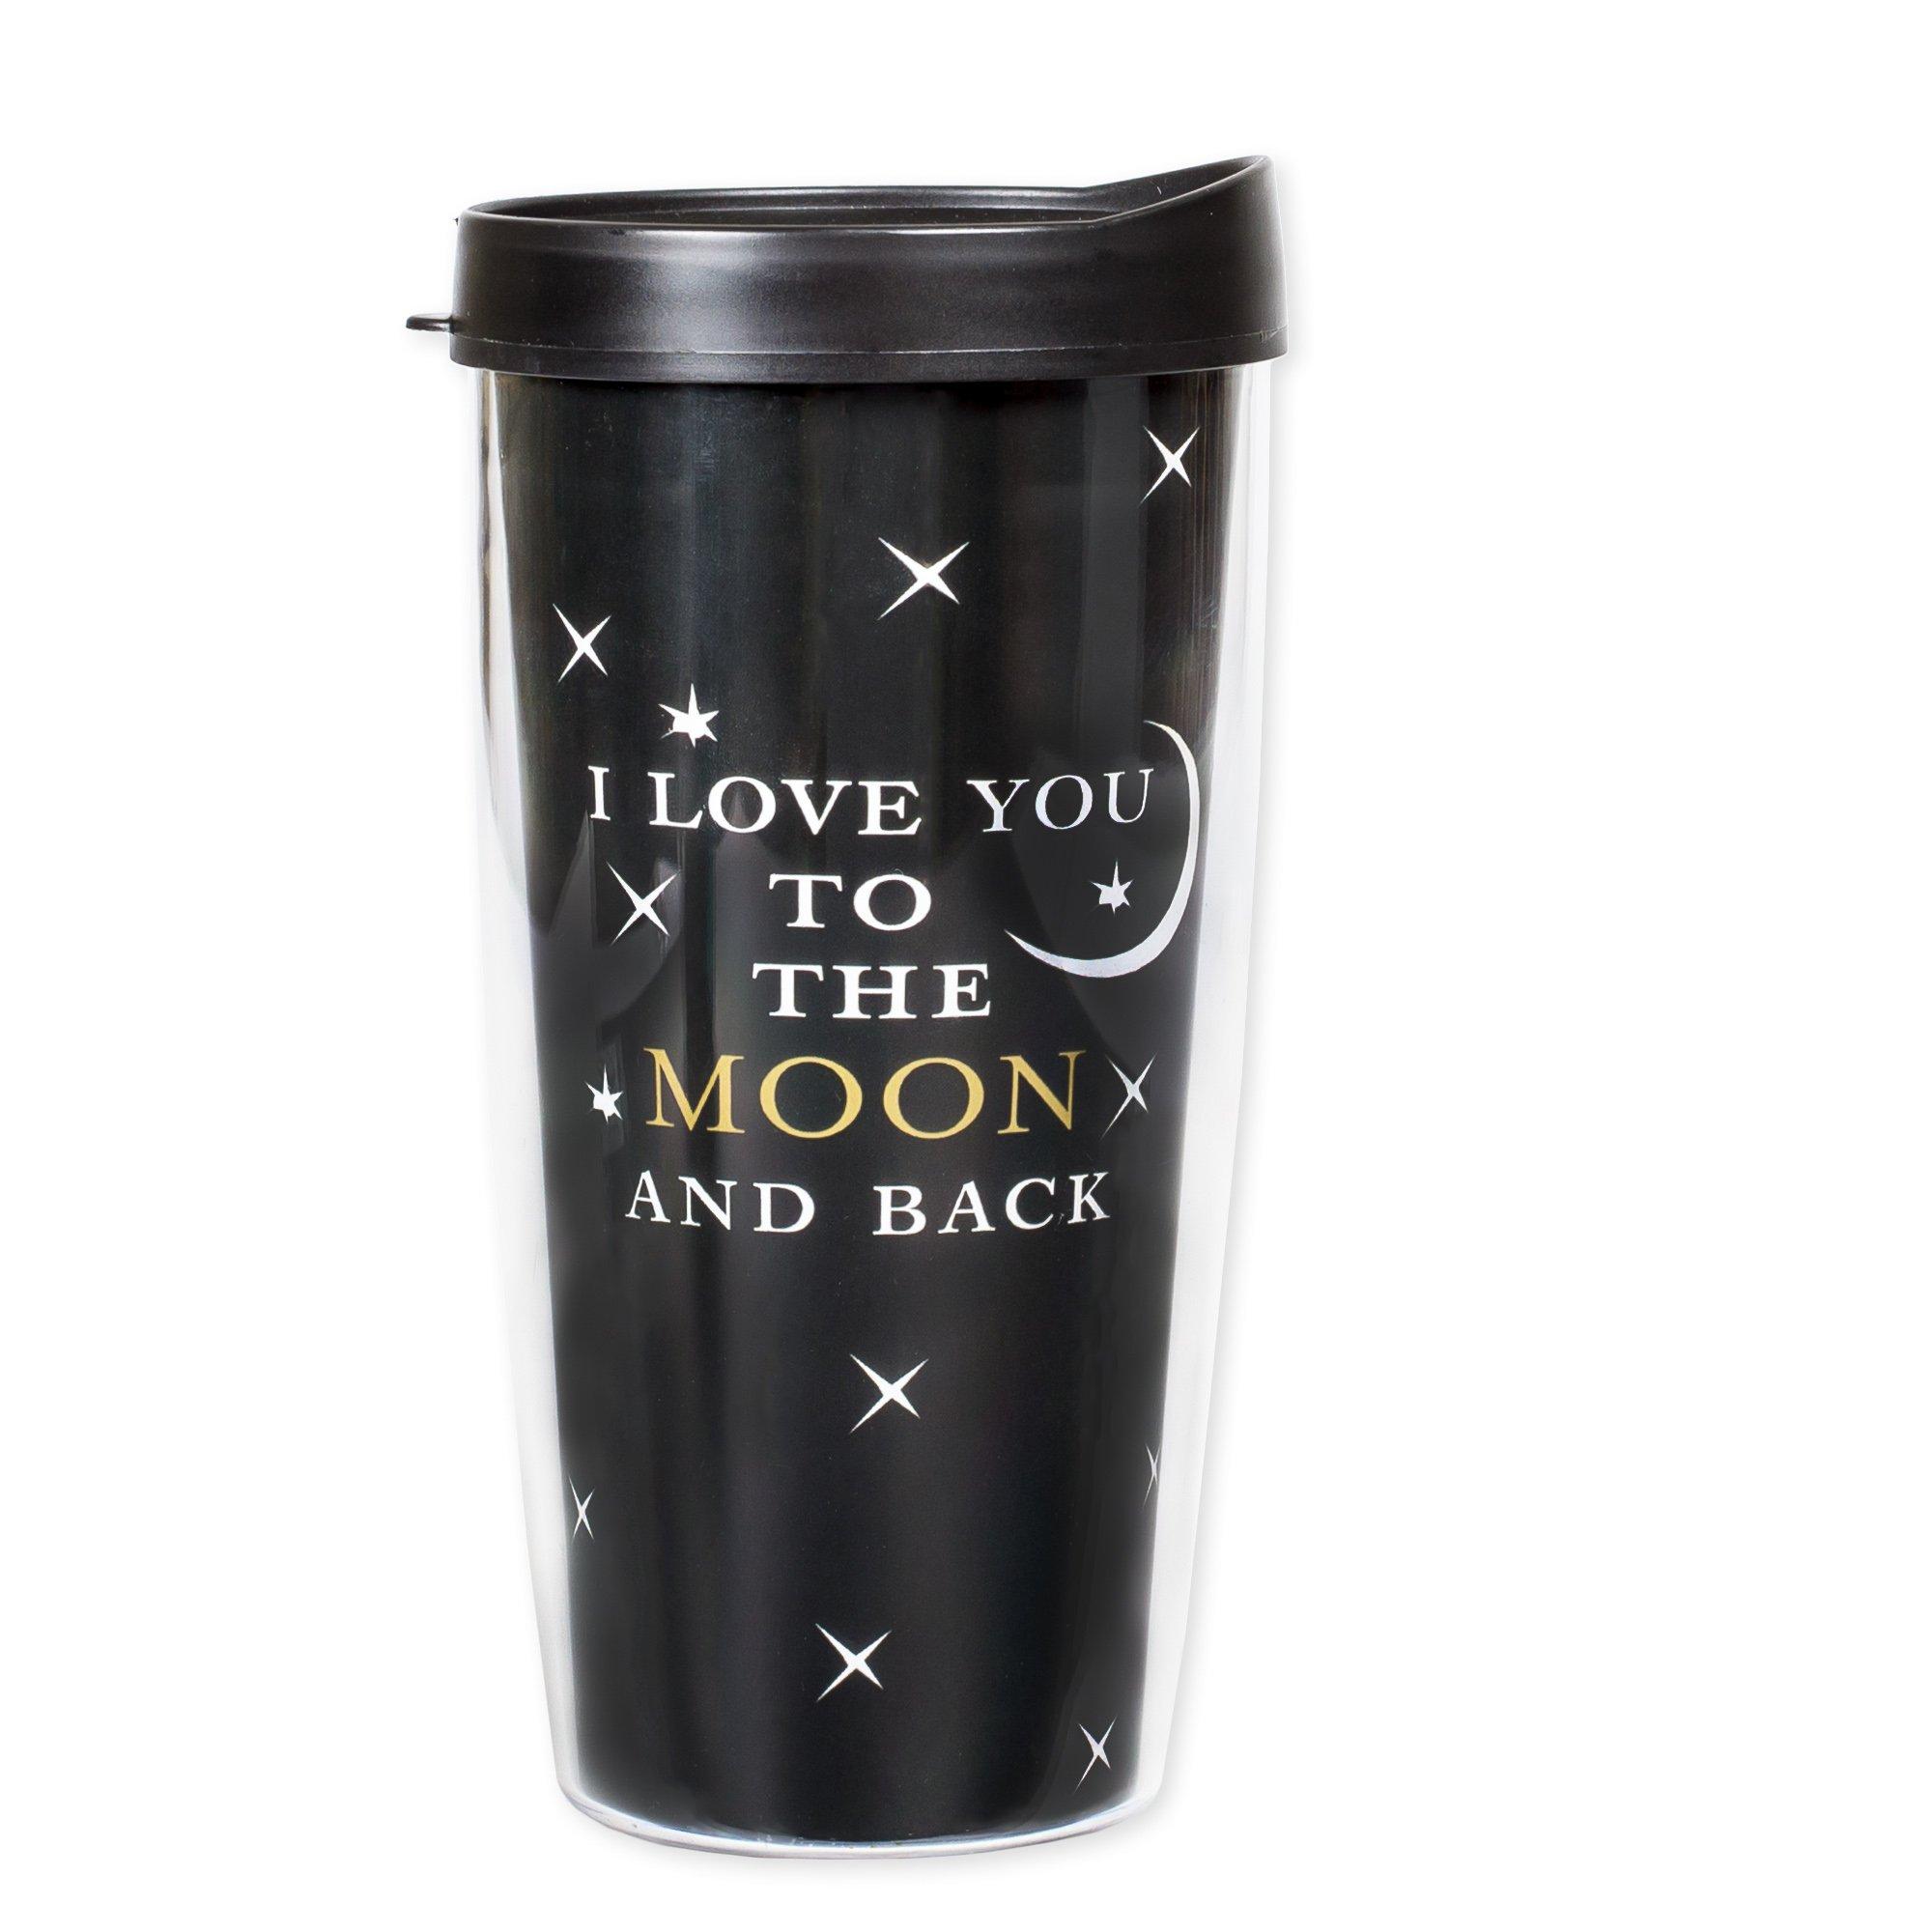 I Love You to the Moon and Back 16 Oz Tumbler Mug with Lid